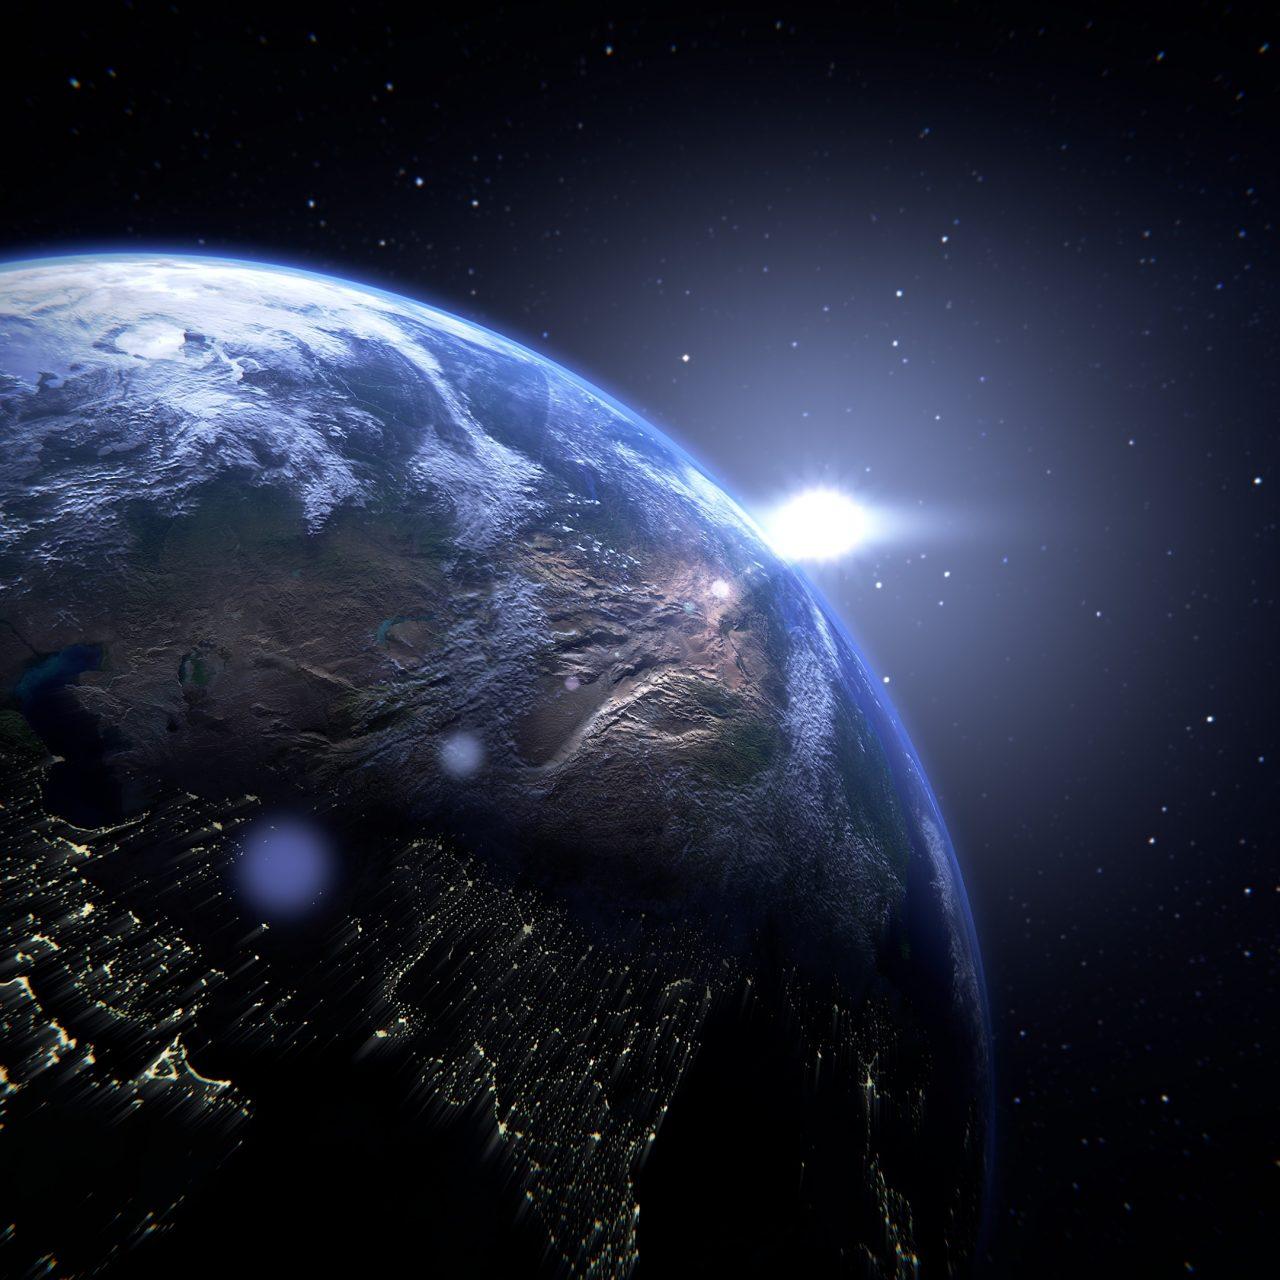 Planet Earth 4K UHD Wallpaper